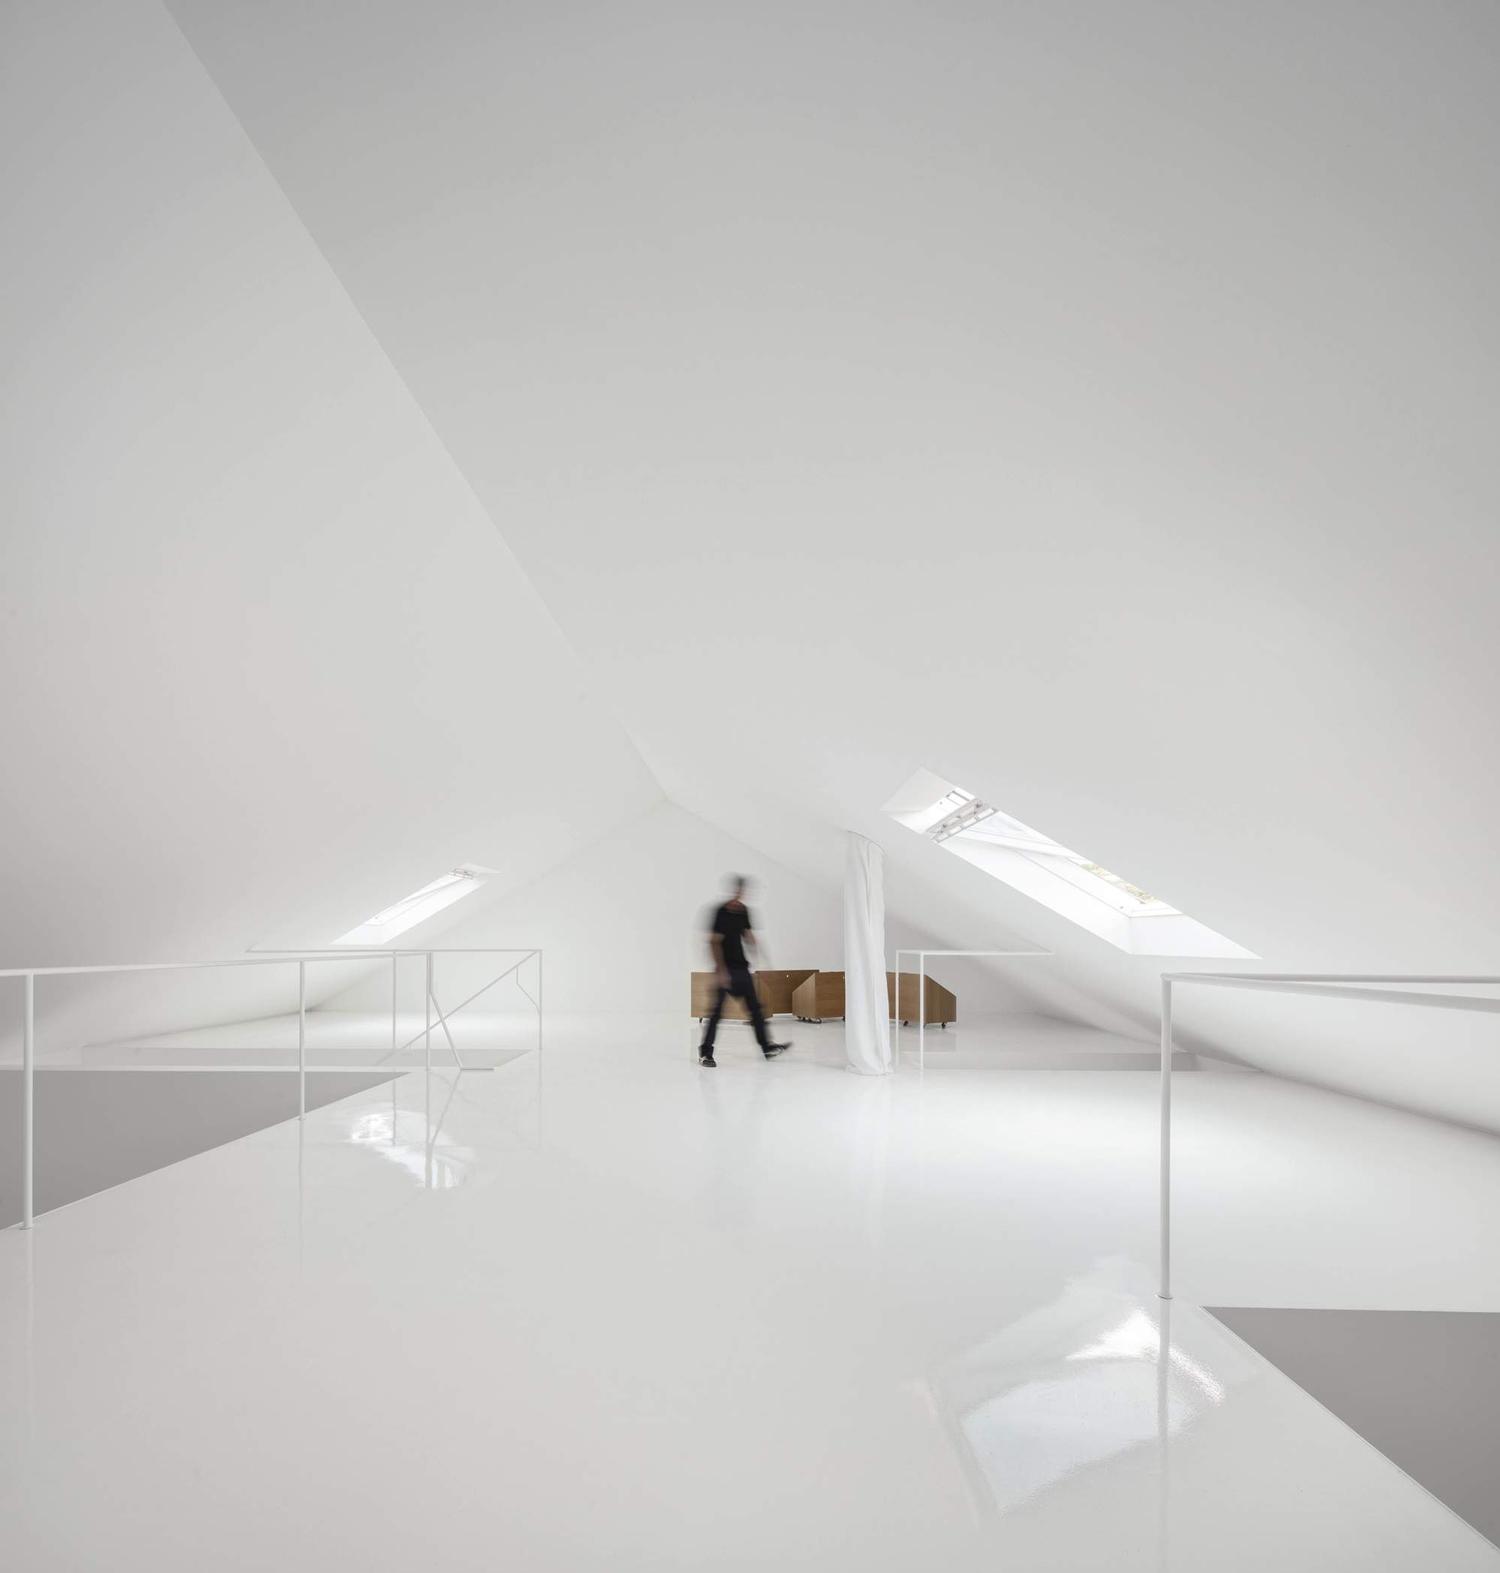 konyhasziget_minimal_haz_portugaliabol_red-house-in-setubal-portugal-by-extrastudio_12.jpg